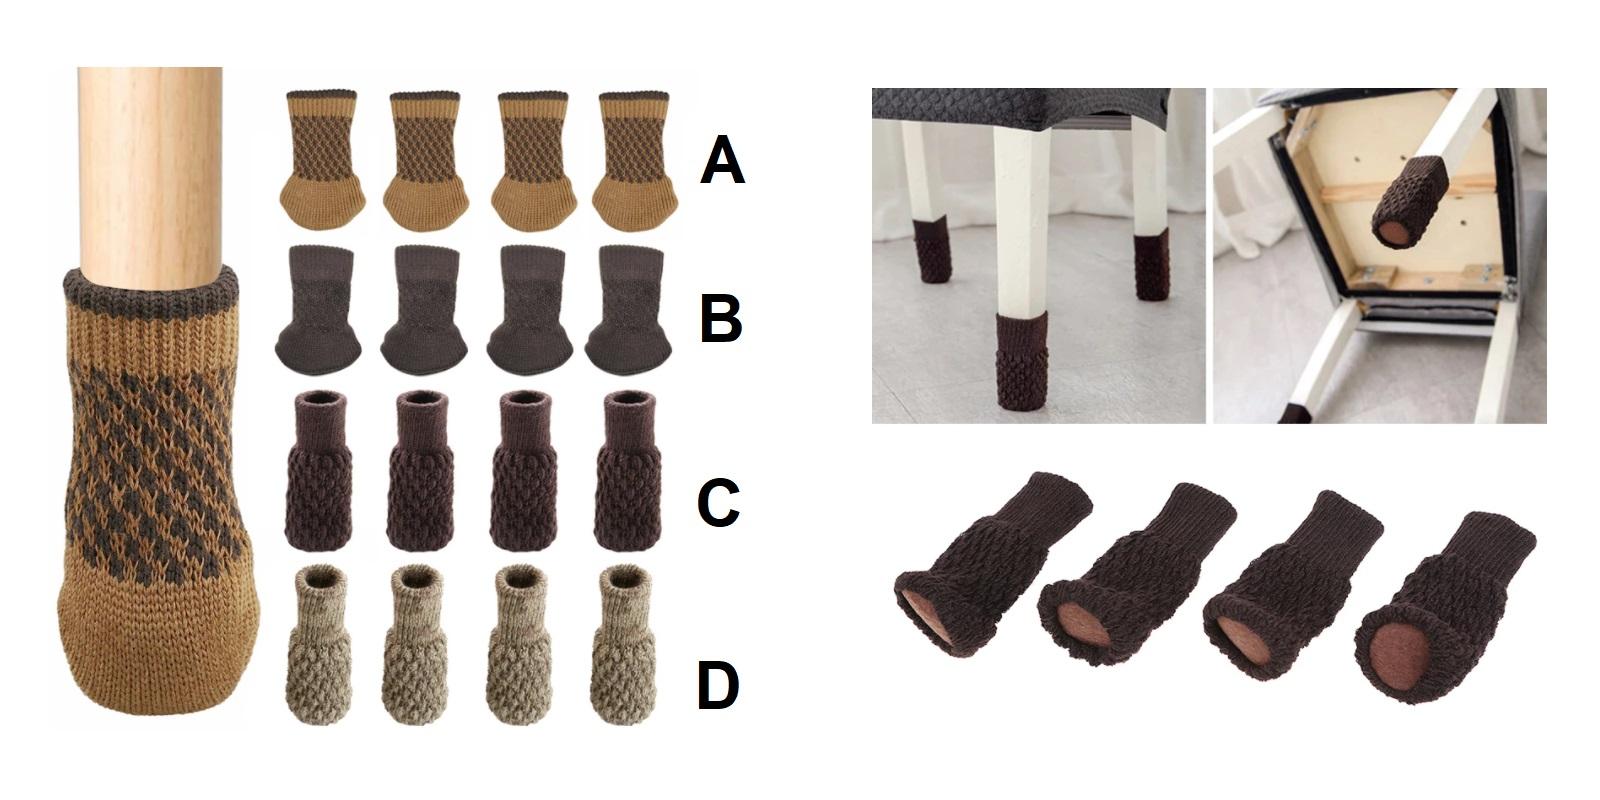 Ochranné návleky na nohy od židle (4 ks) / A-001413